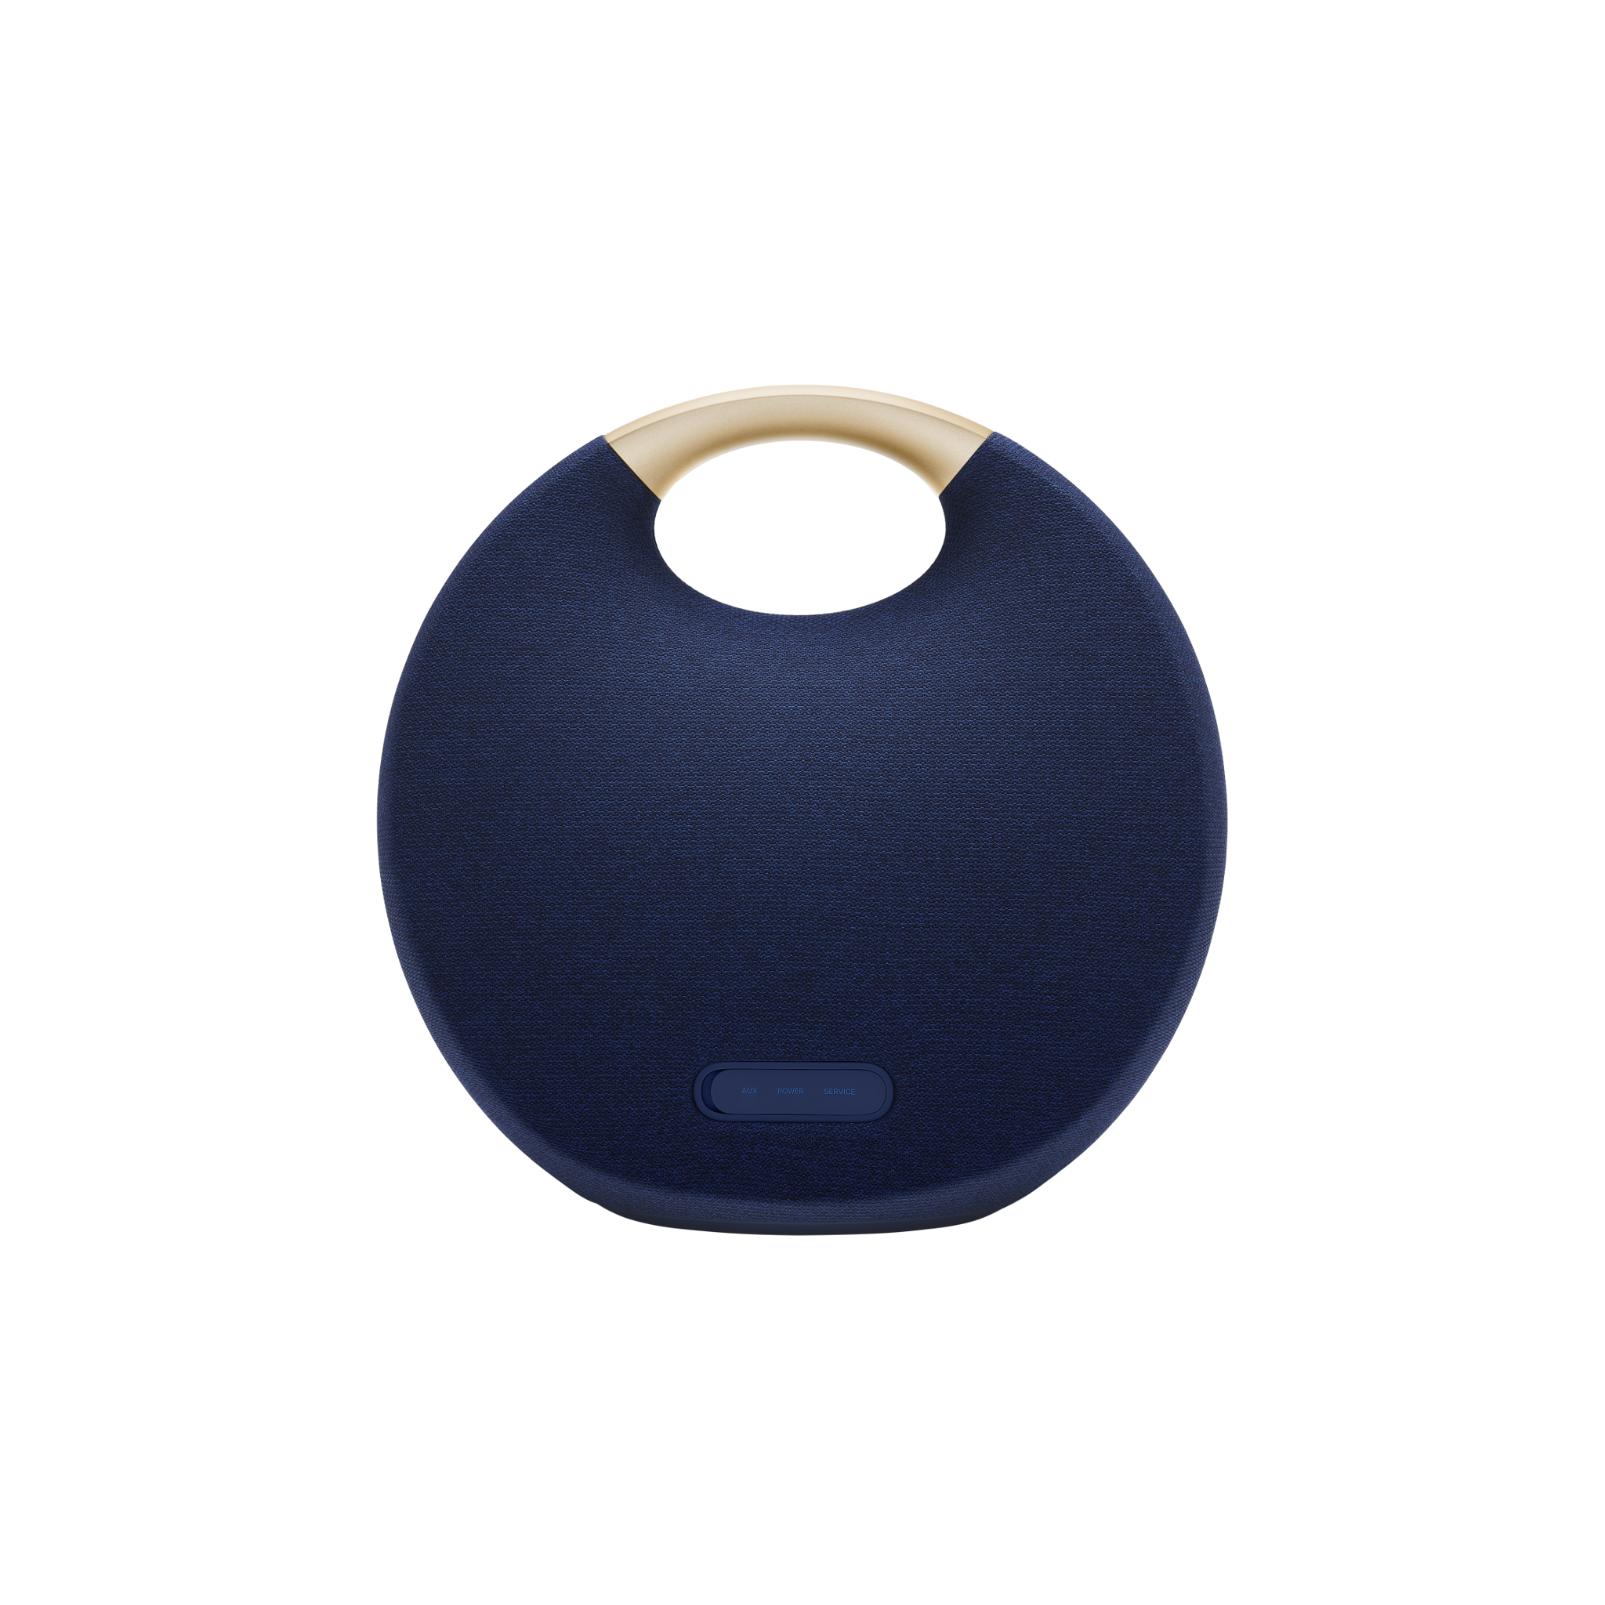 Harman Kardon Onyx Studio 6 Portable Wireless Bluetooth Speaker